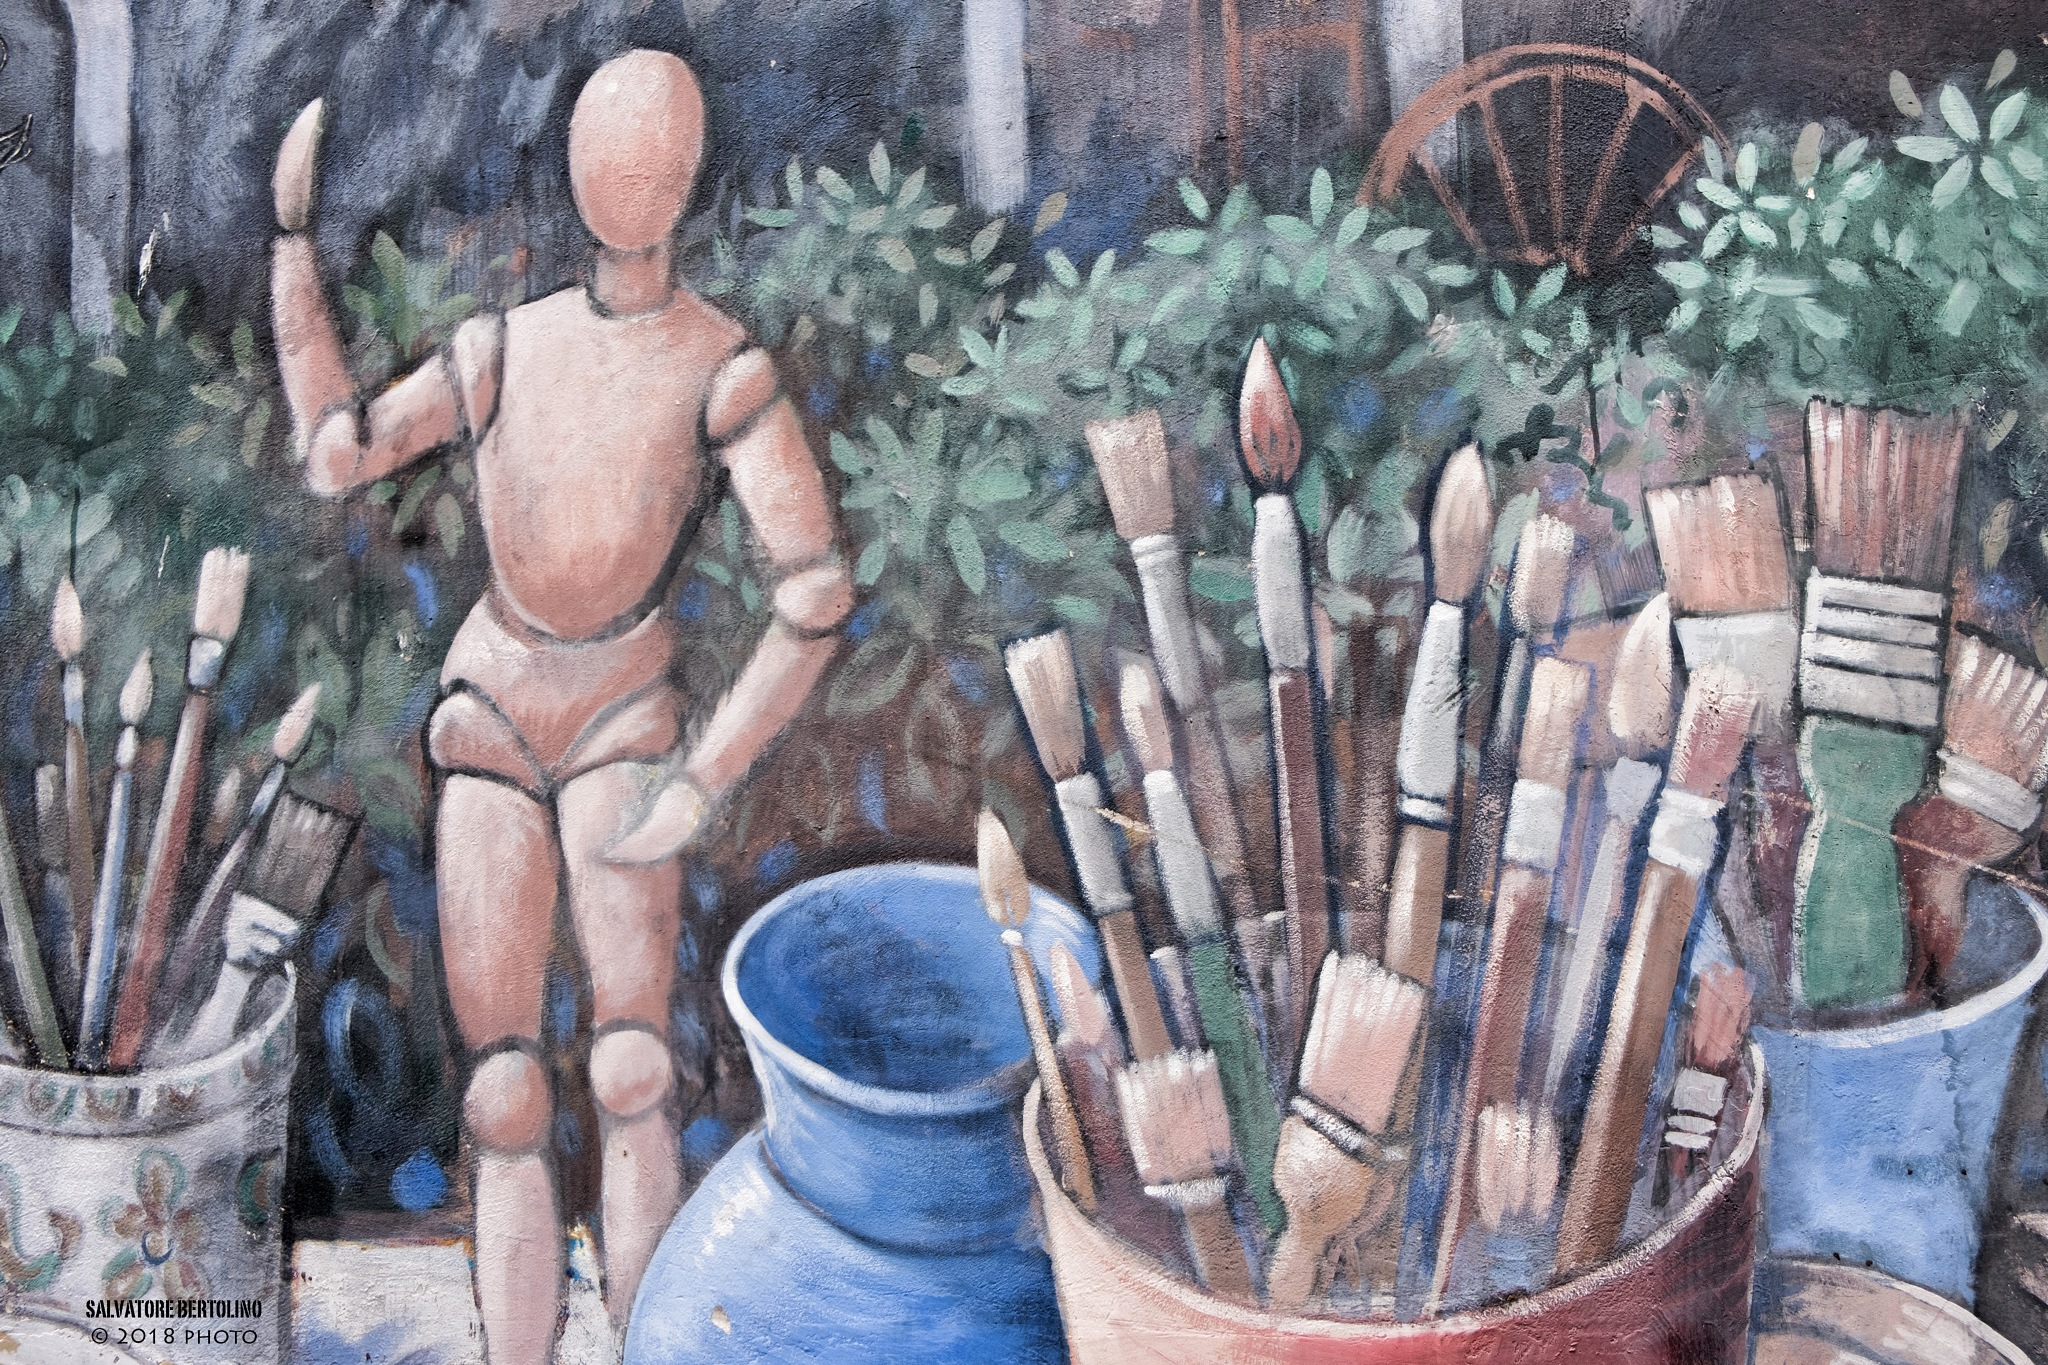 L' uomo metafisico by Salvatore Bertolino